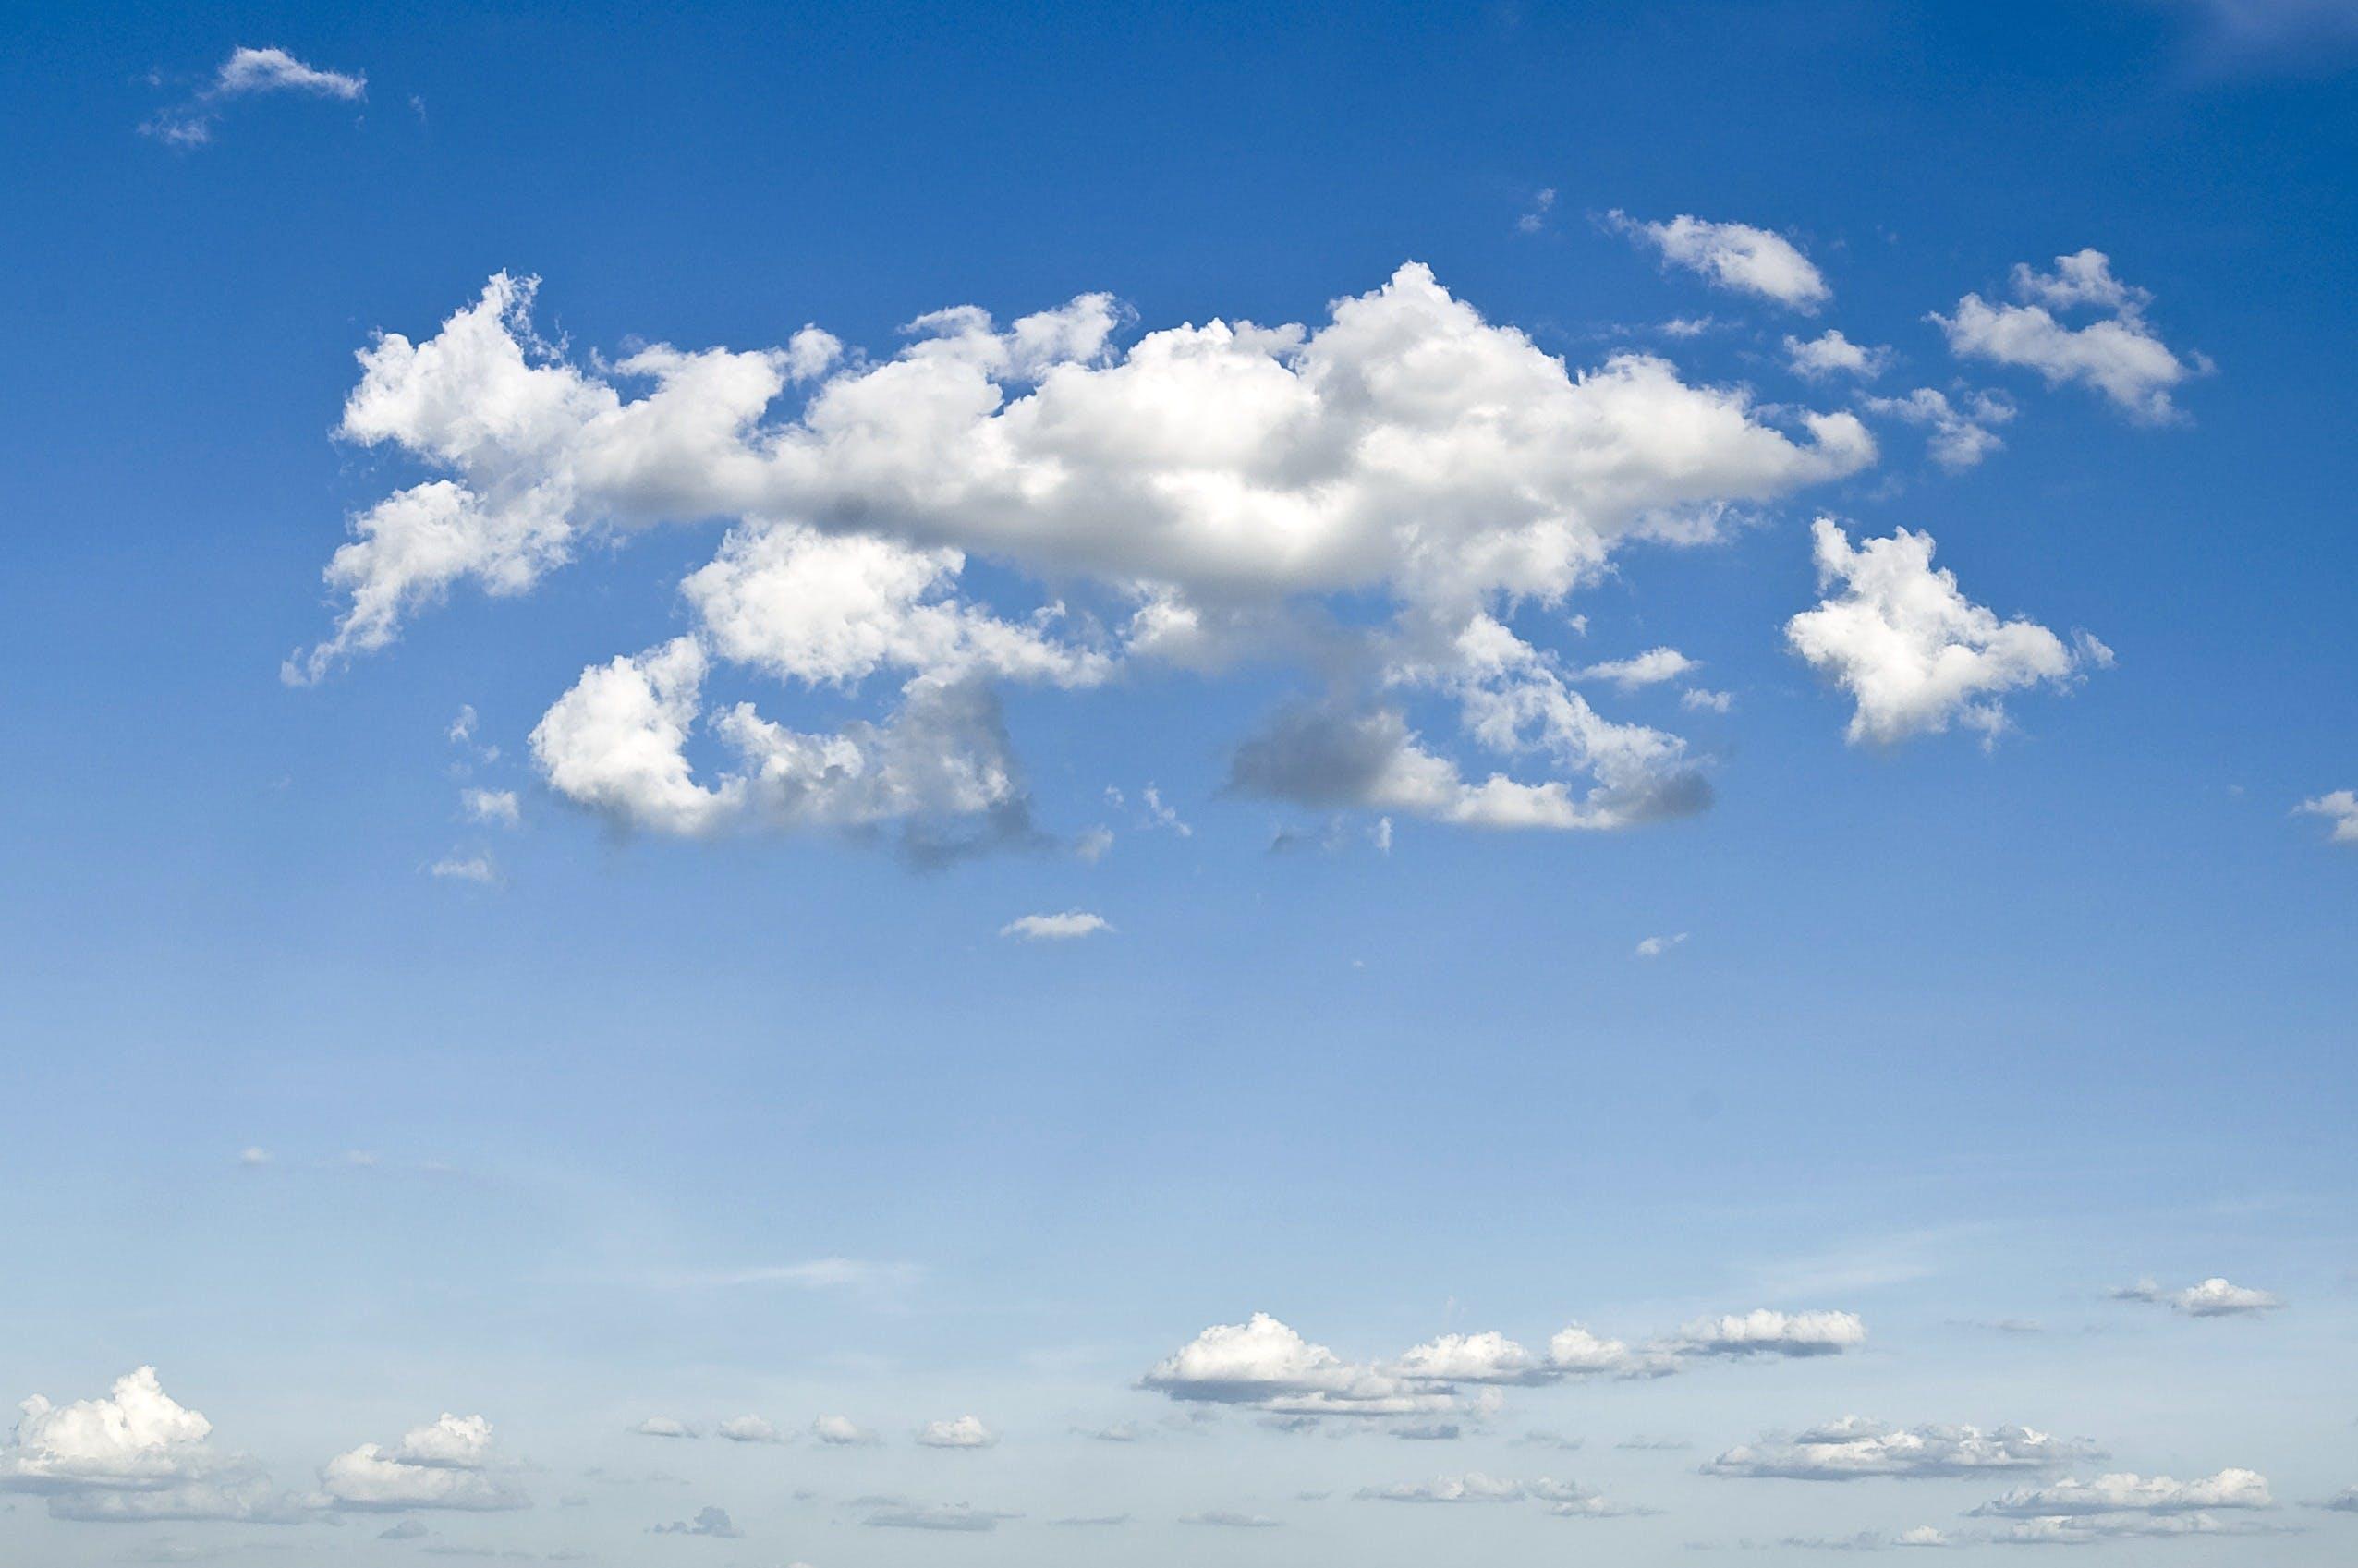 Fotobanka sbezplatnými fotkami na tému HD tapeta, mraky, obloha, oblohy